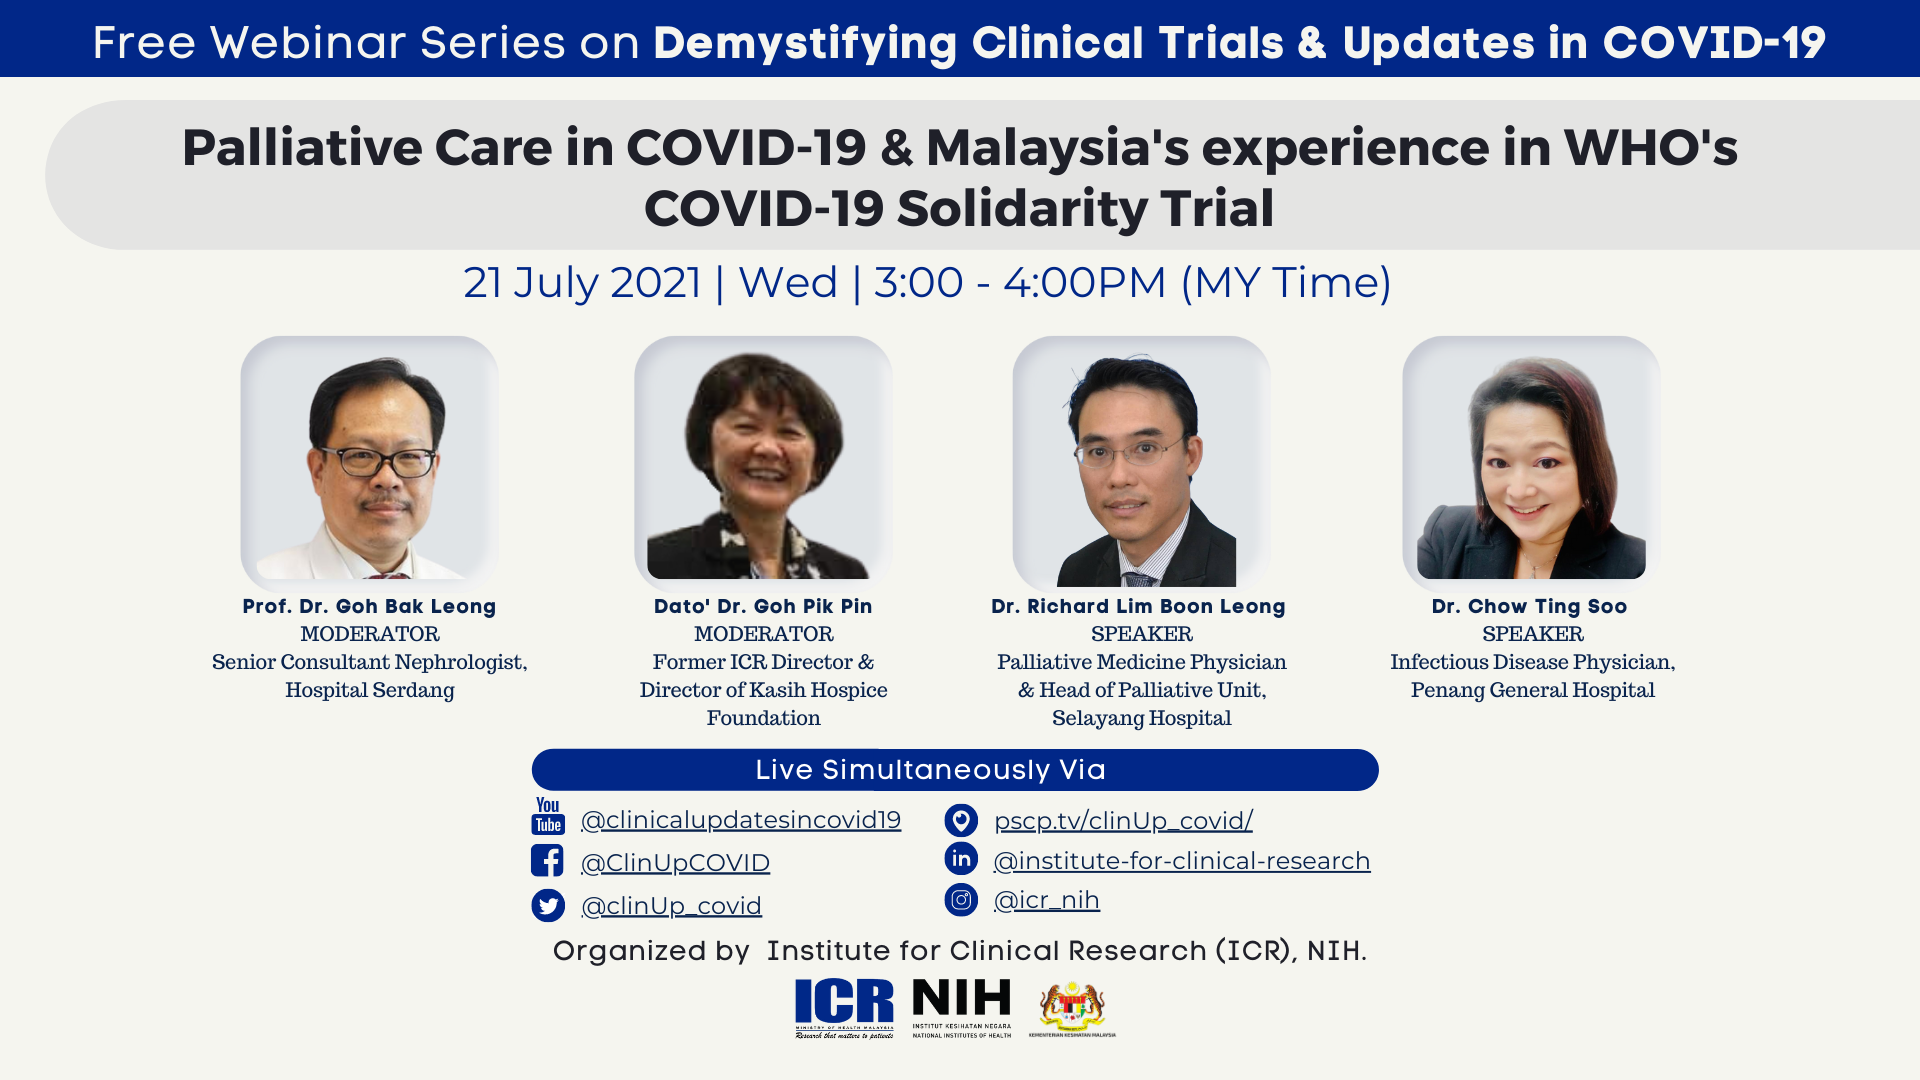 Palliative Care in COVID-19 & Malaysia's experience in WHO's COVID-19 Solidarity Trial